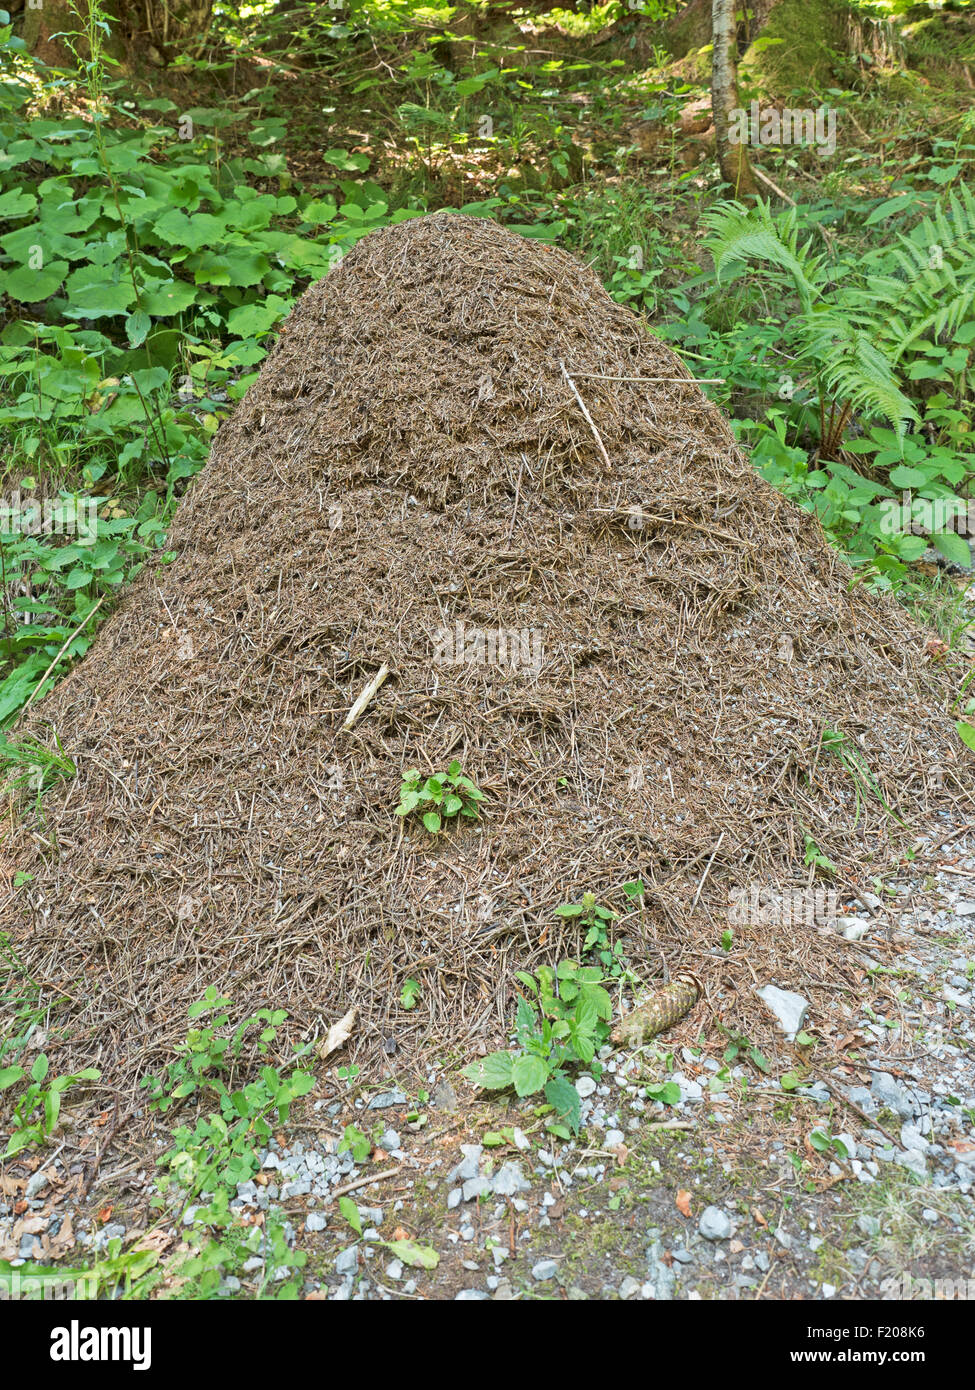 Ameisenhaufen - Stock Image